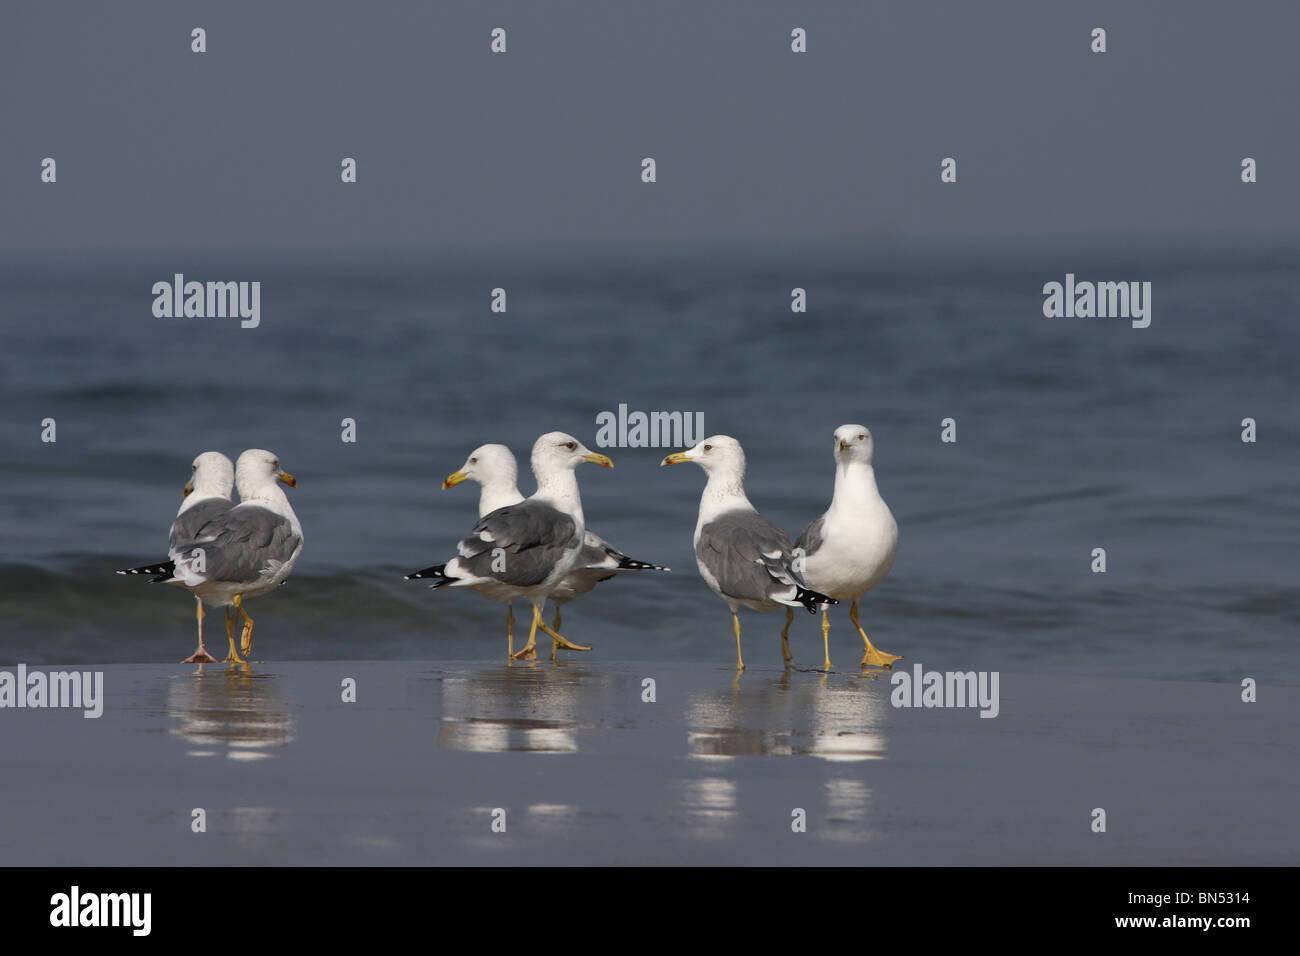 Birds, Black-headed Gull (Winter Visiter and Passage Migrant), Chroicocephalus ridibundus, Laridae, Tarakrali Beach, - Stock Image